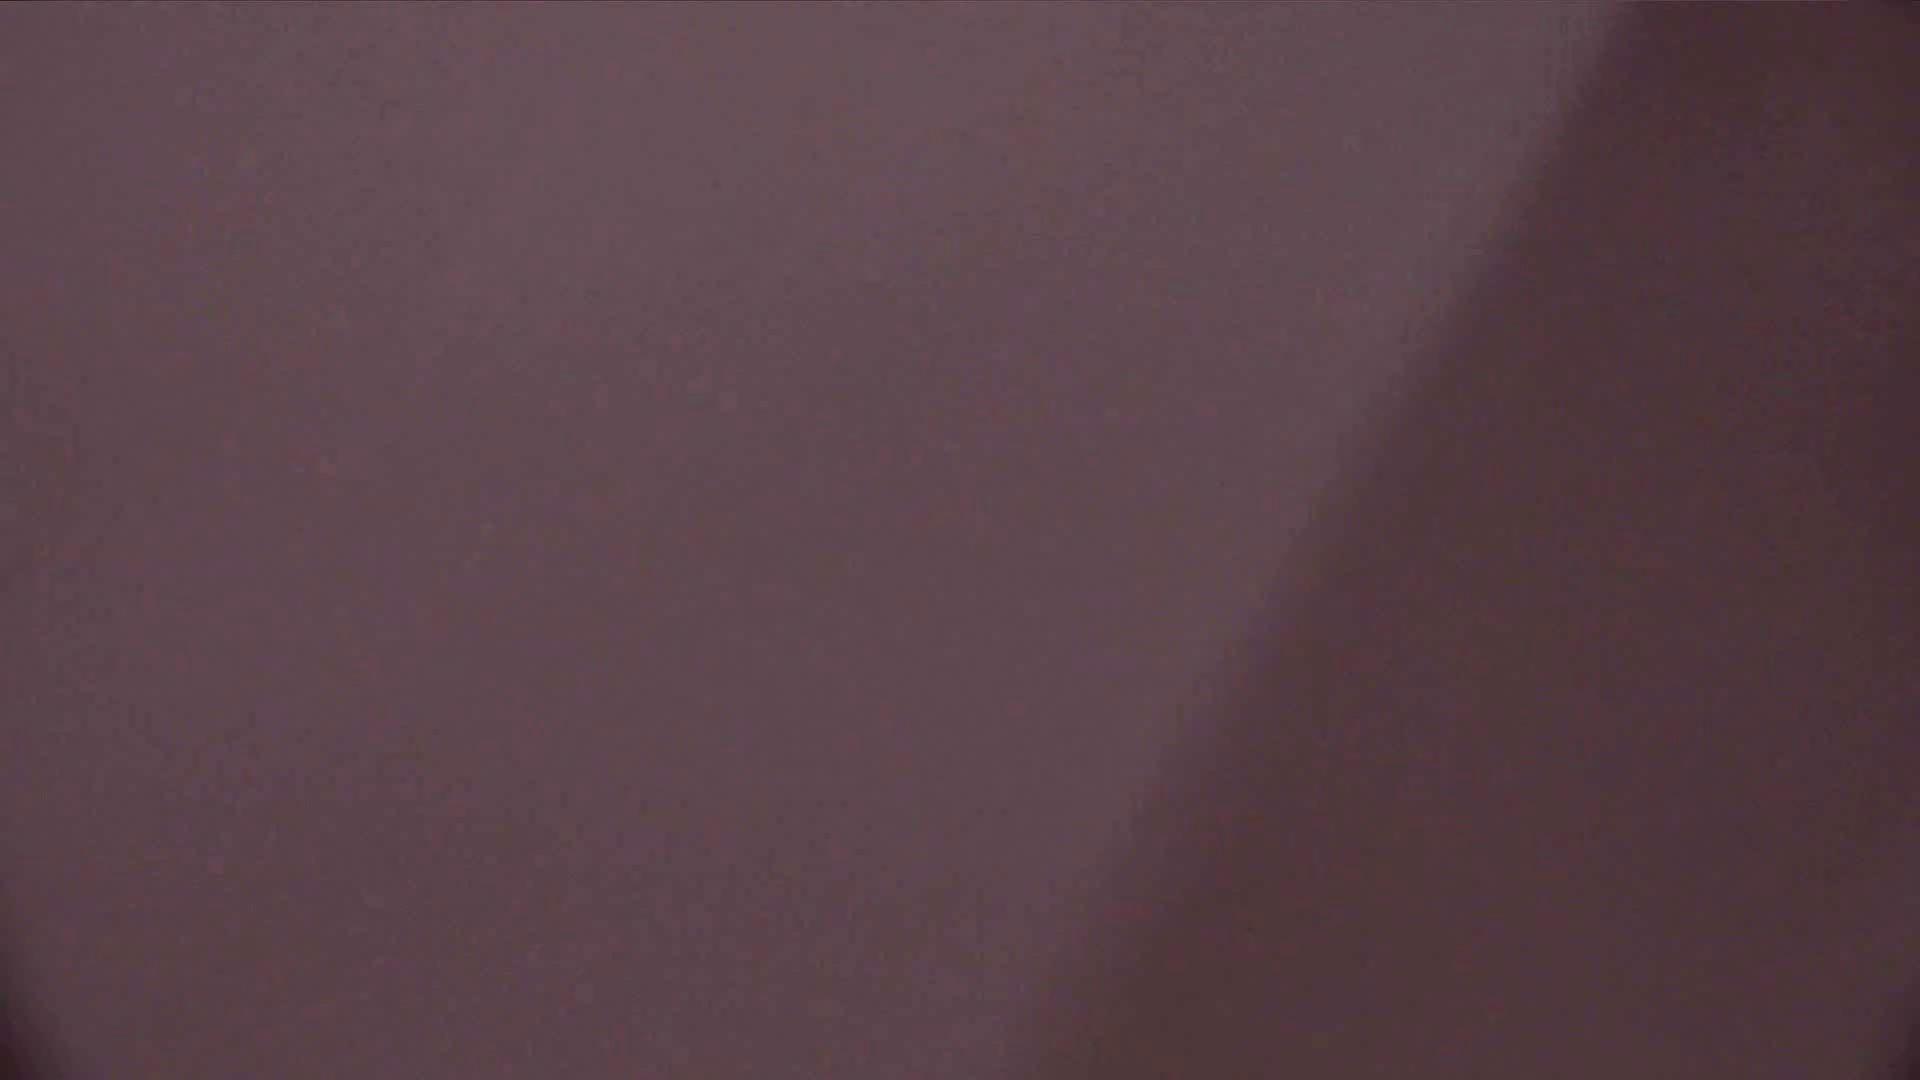 vol.17 命がけ潜伏洗面所! 張り裂けんばかりの大物 潜入   OLセックス  108画像 41